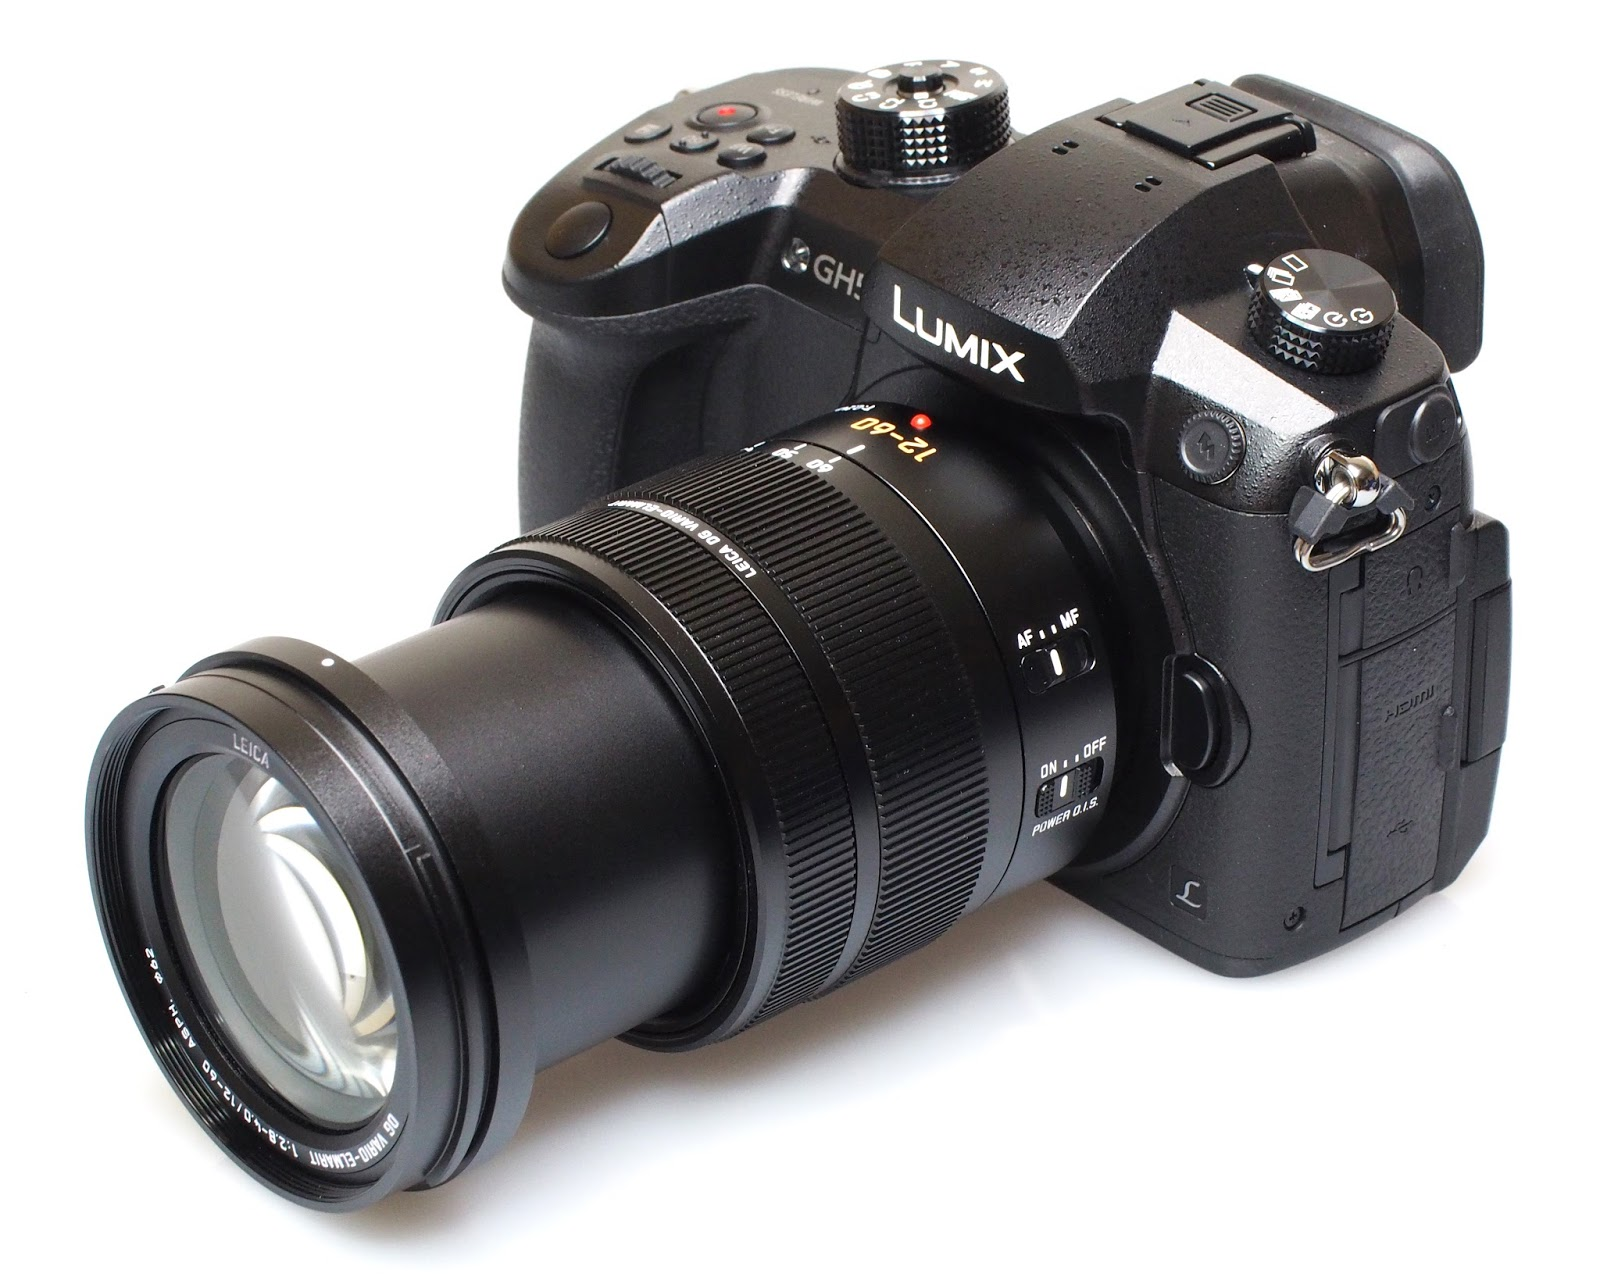 Panasonic Lumix GH5 с комплектным объективом Leica 12-60mm f/2.8-4.0